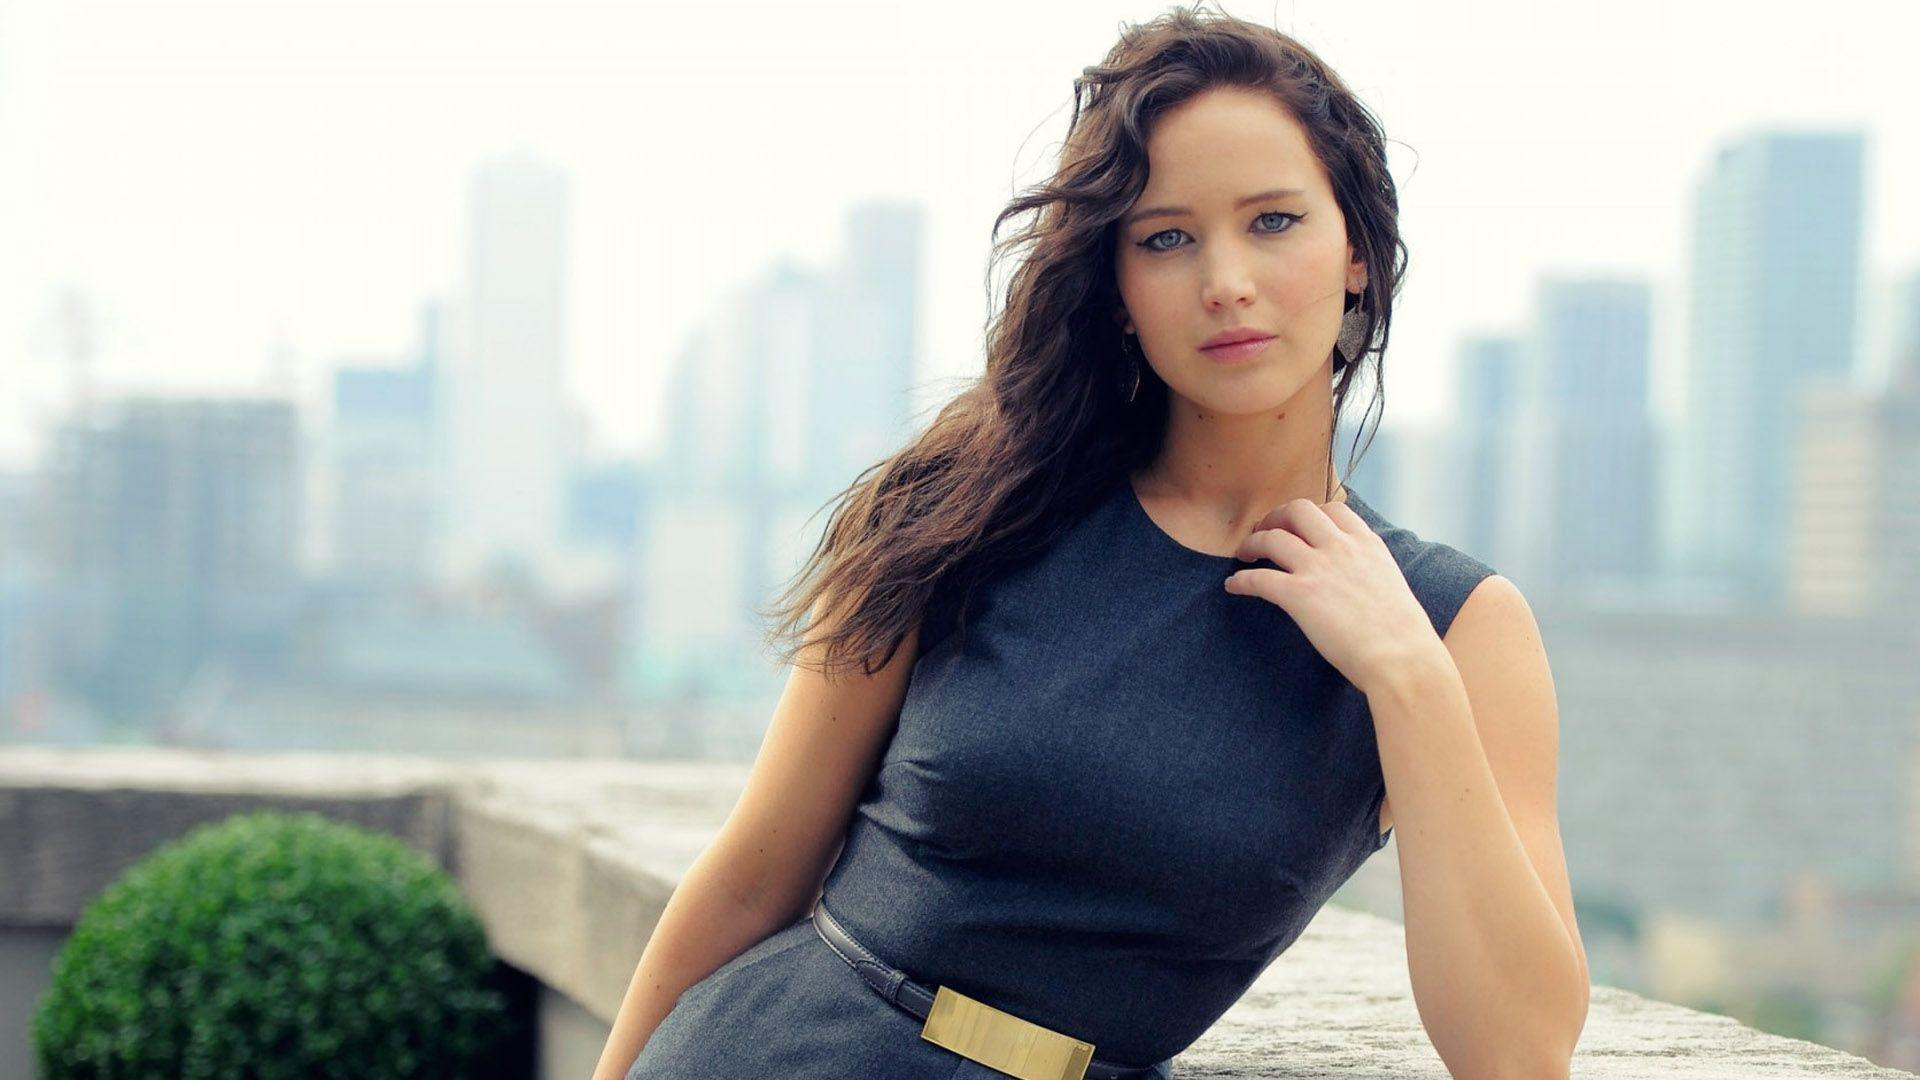 Wallpapers For > Jennifer Lawrence Body Wallpaper Hd